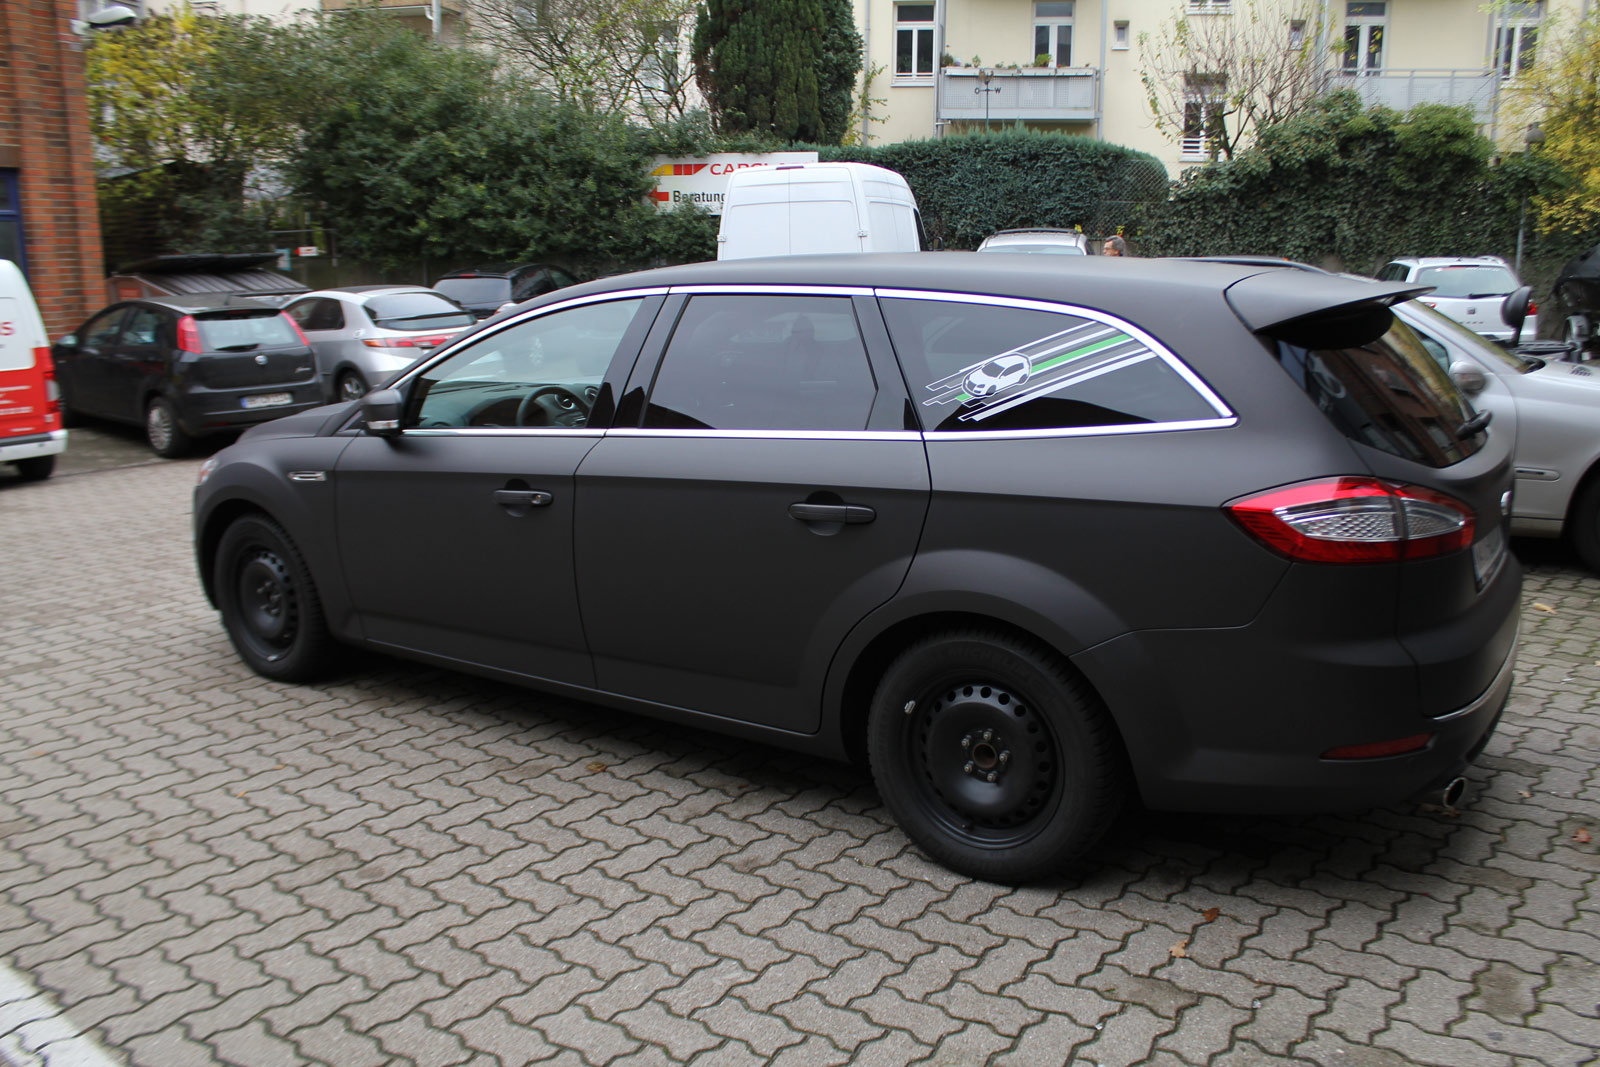 Ford_Mondeo_Folierung_Schwarz_Braun_Matt_Metallic_15